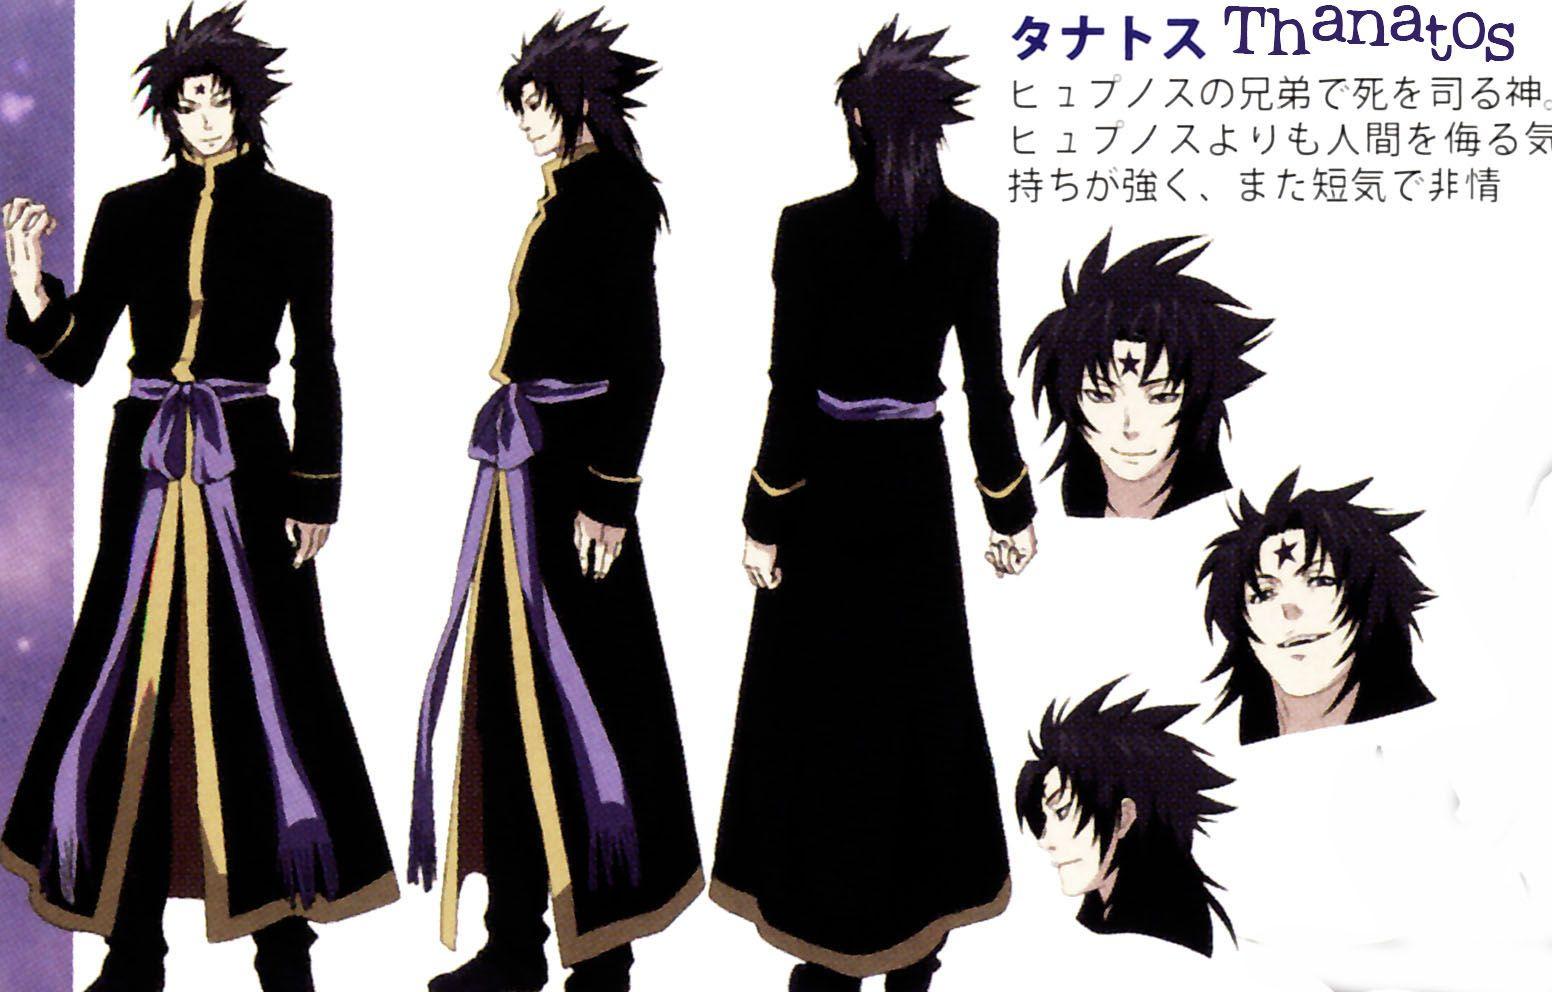 Canvas 2 Anime Characters : Afficher l image d origine saint seiya character sheet